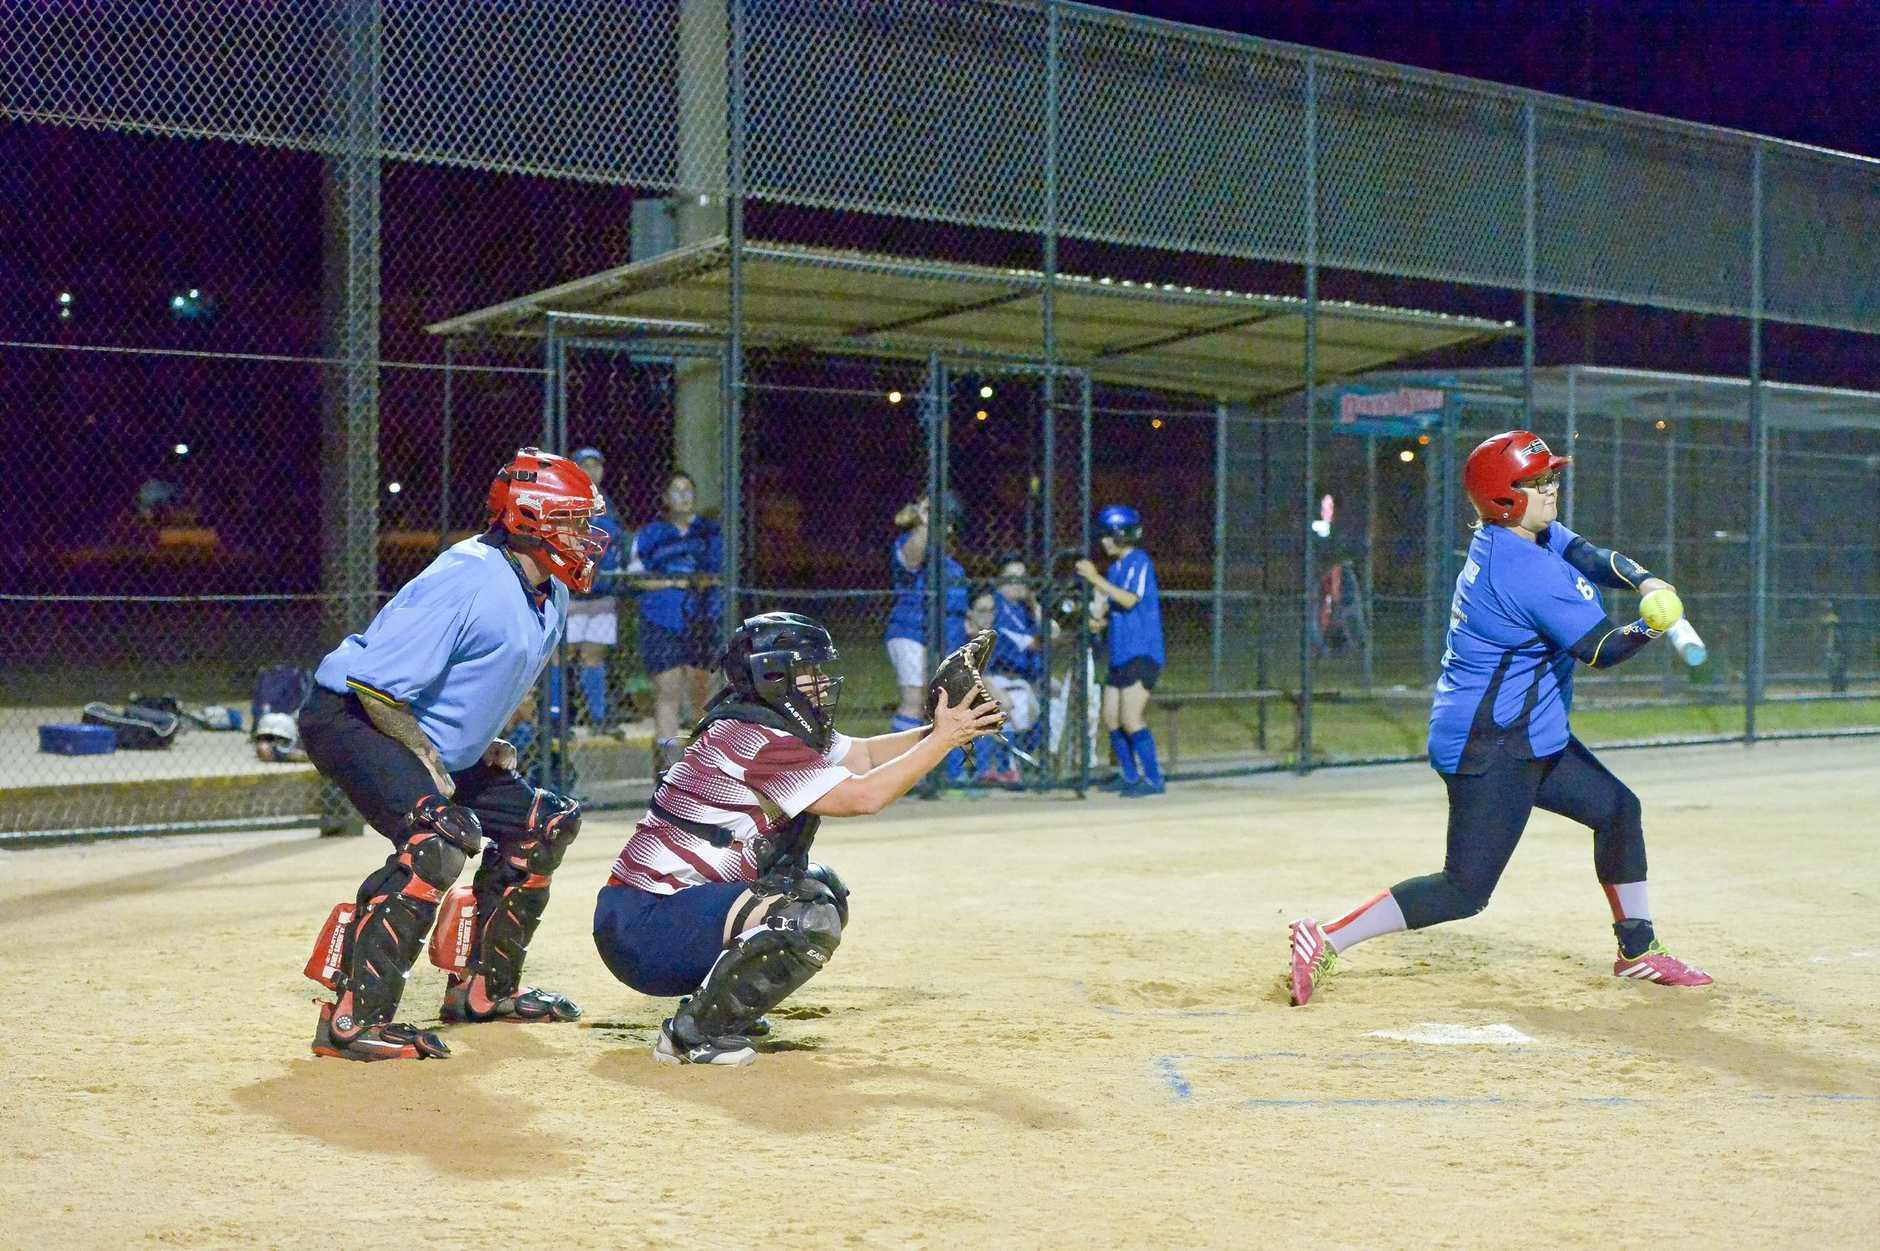 Gladstone softball grand final  Telfords vs Souths Blue.